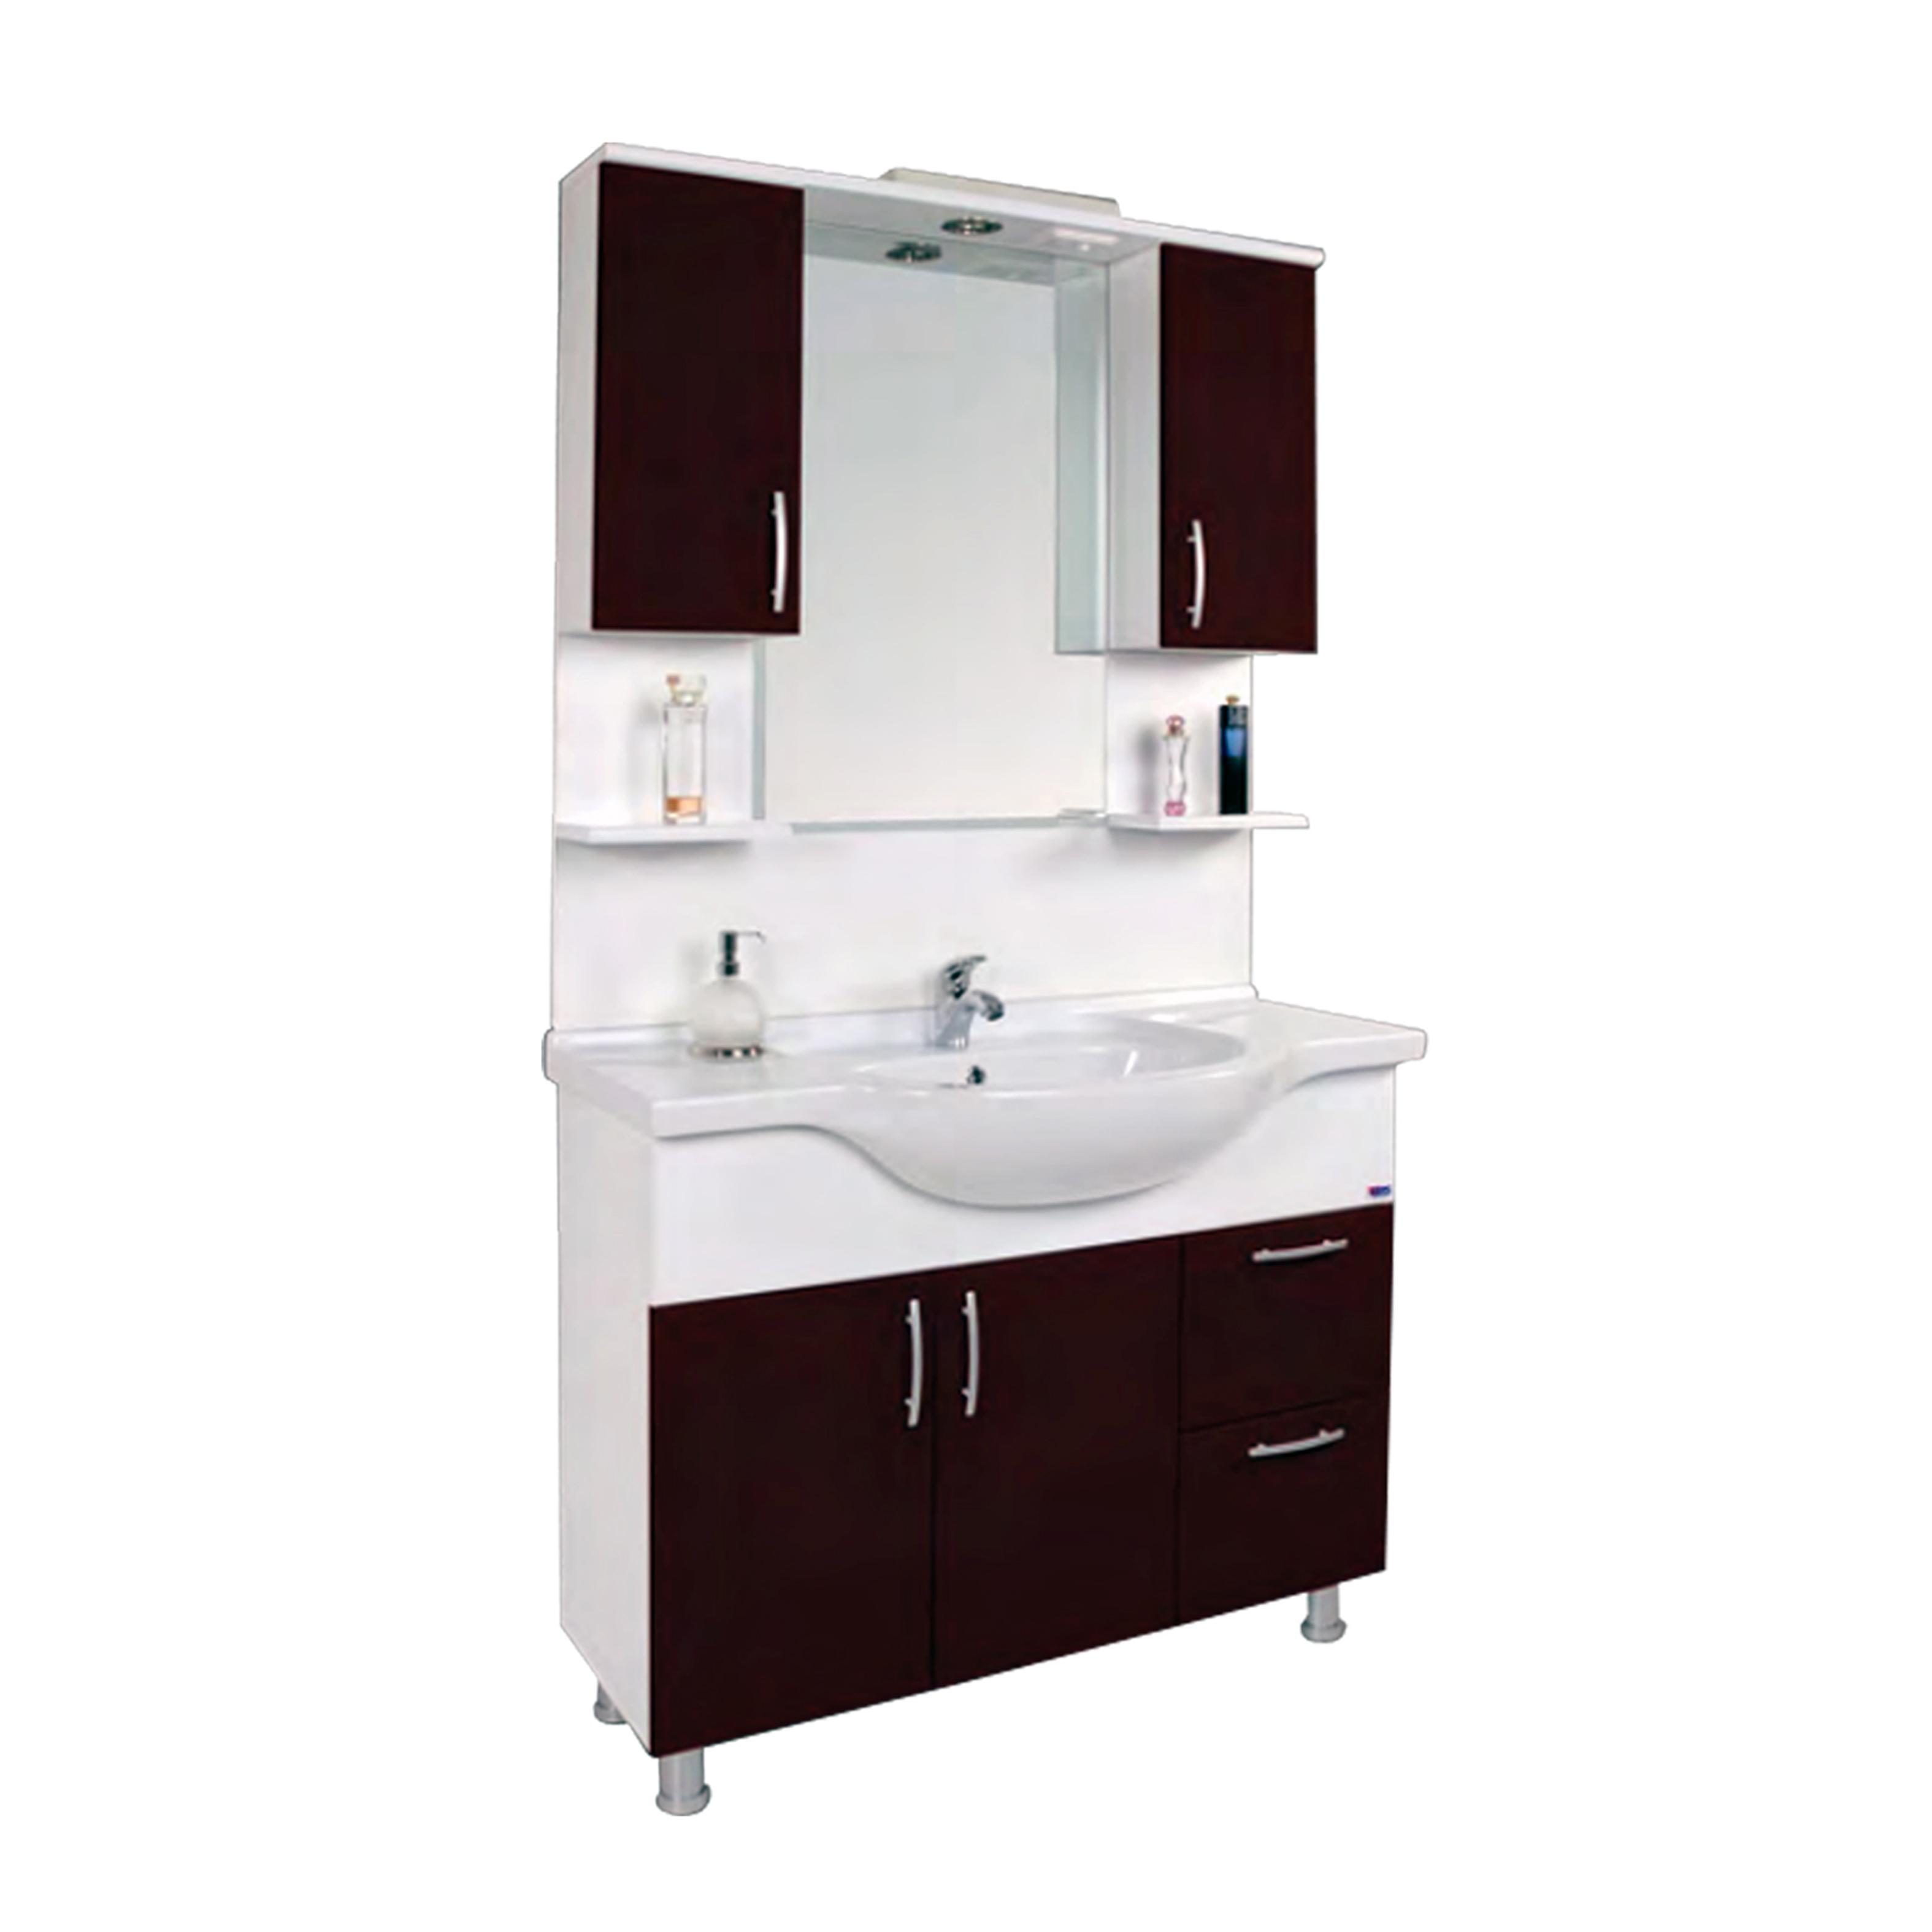 Fine Cheap Best Quality Ada Bathroom Cabinet Made In Turkey Bathroom Vanities Buy Modern Bathroom Cabinets Ready Made Bathroom Cabinet Bathroom Vanity Home Interior And Landscaping Palasignezvosmurscom